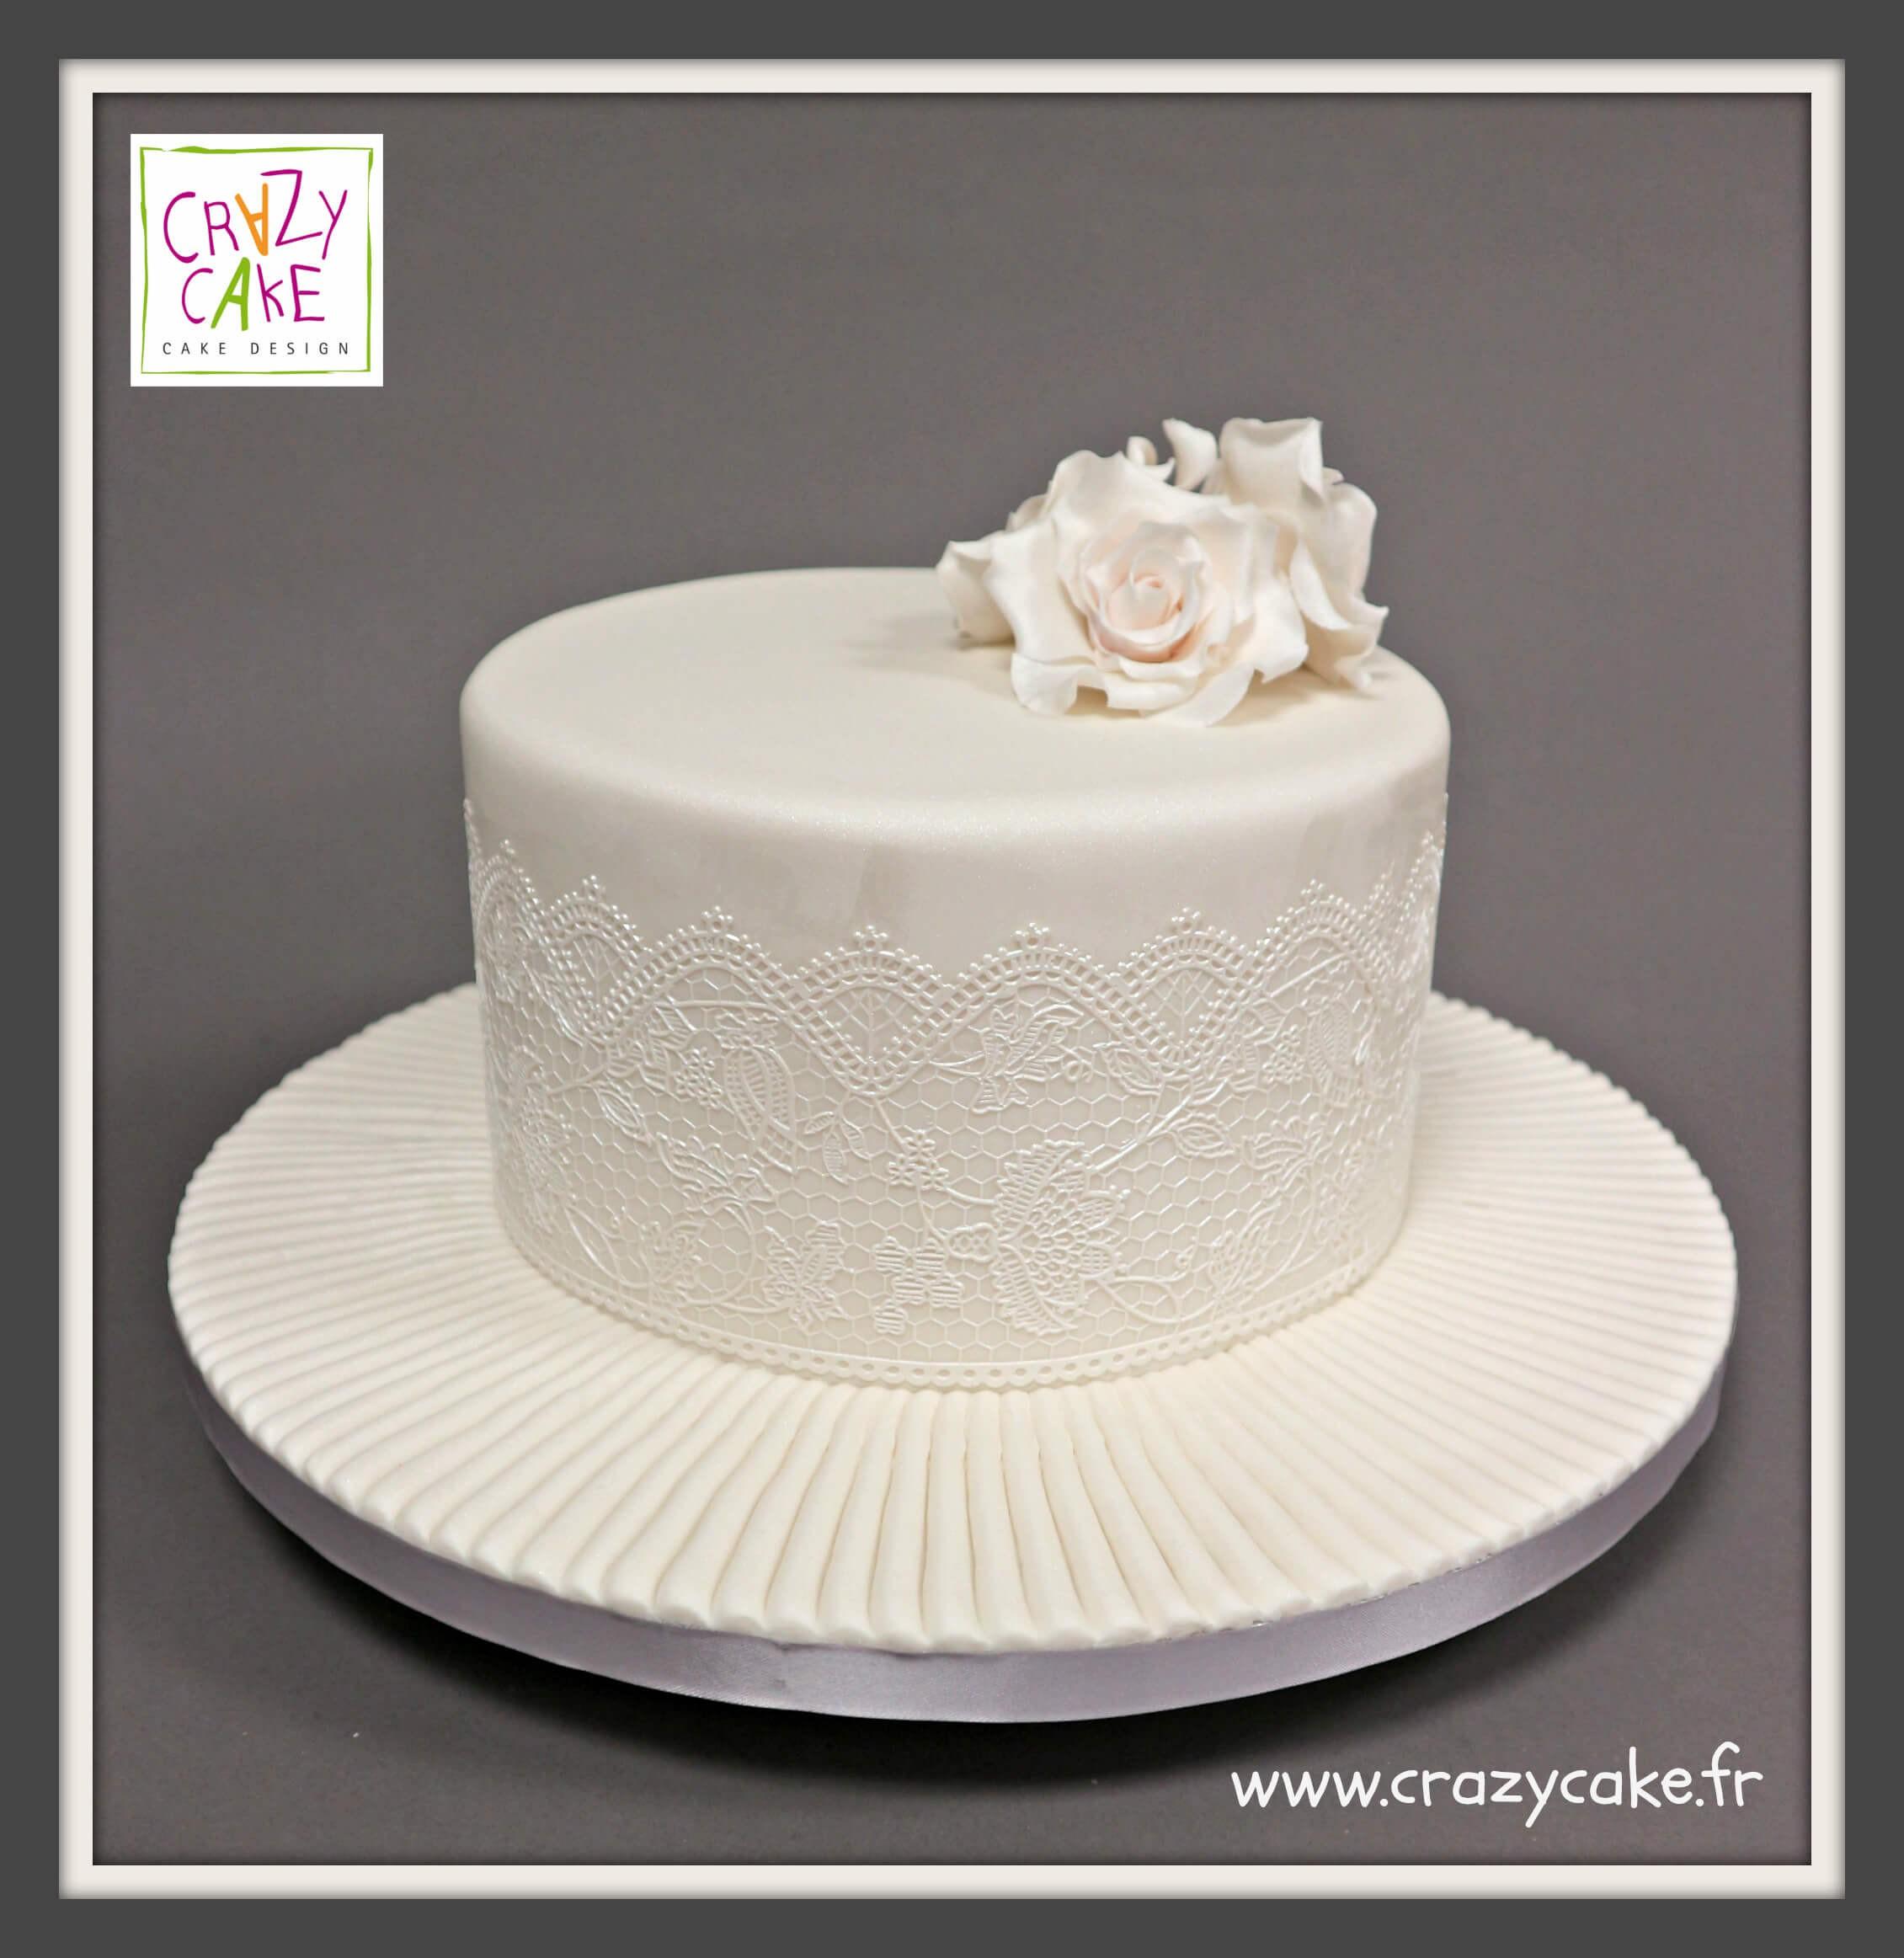 Gâteau Boheme Chic Crazy Cake